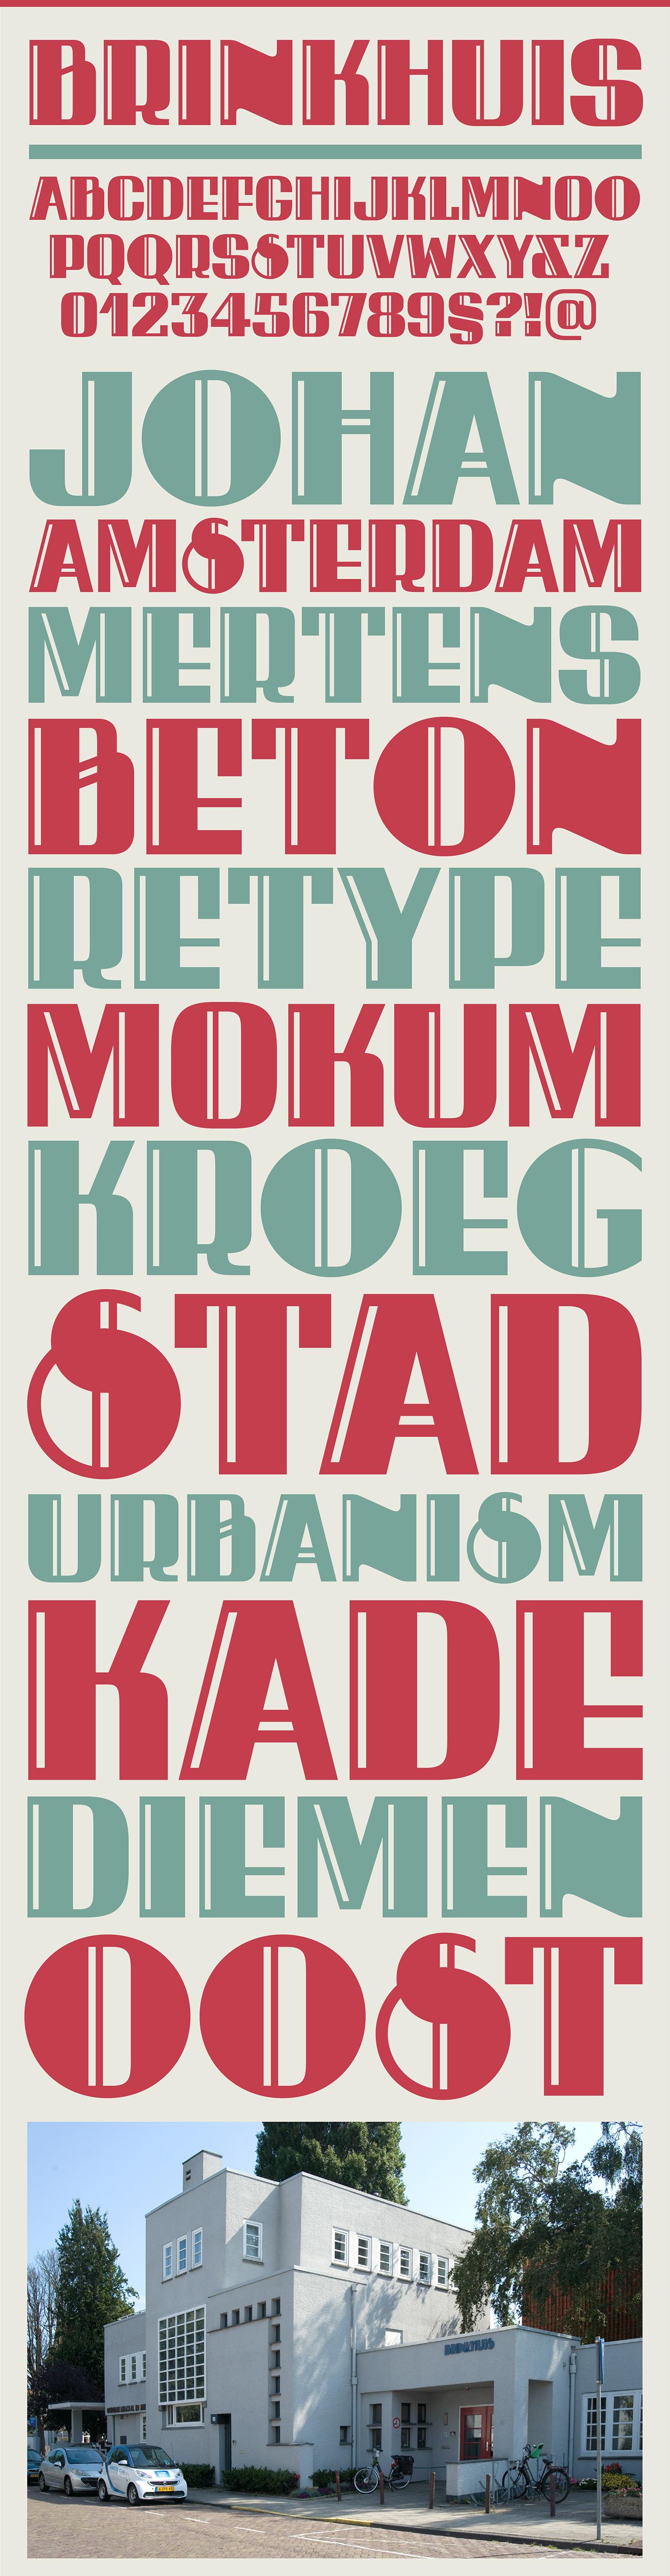 amsterdam Amsterdamse school architect letters modular poster font Ramiro Espinoza vernacular